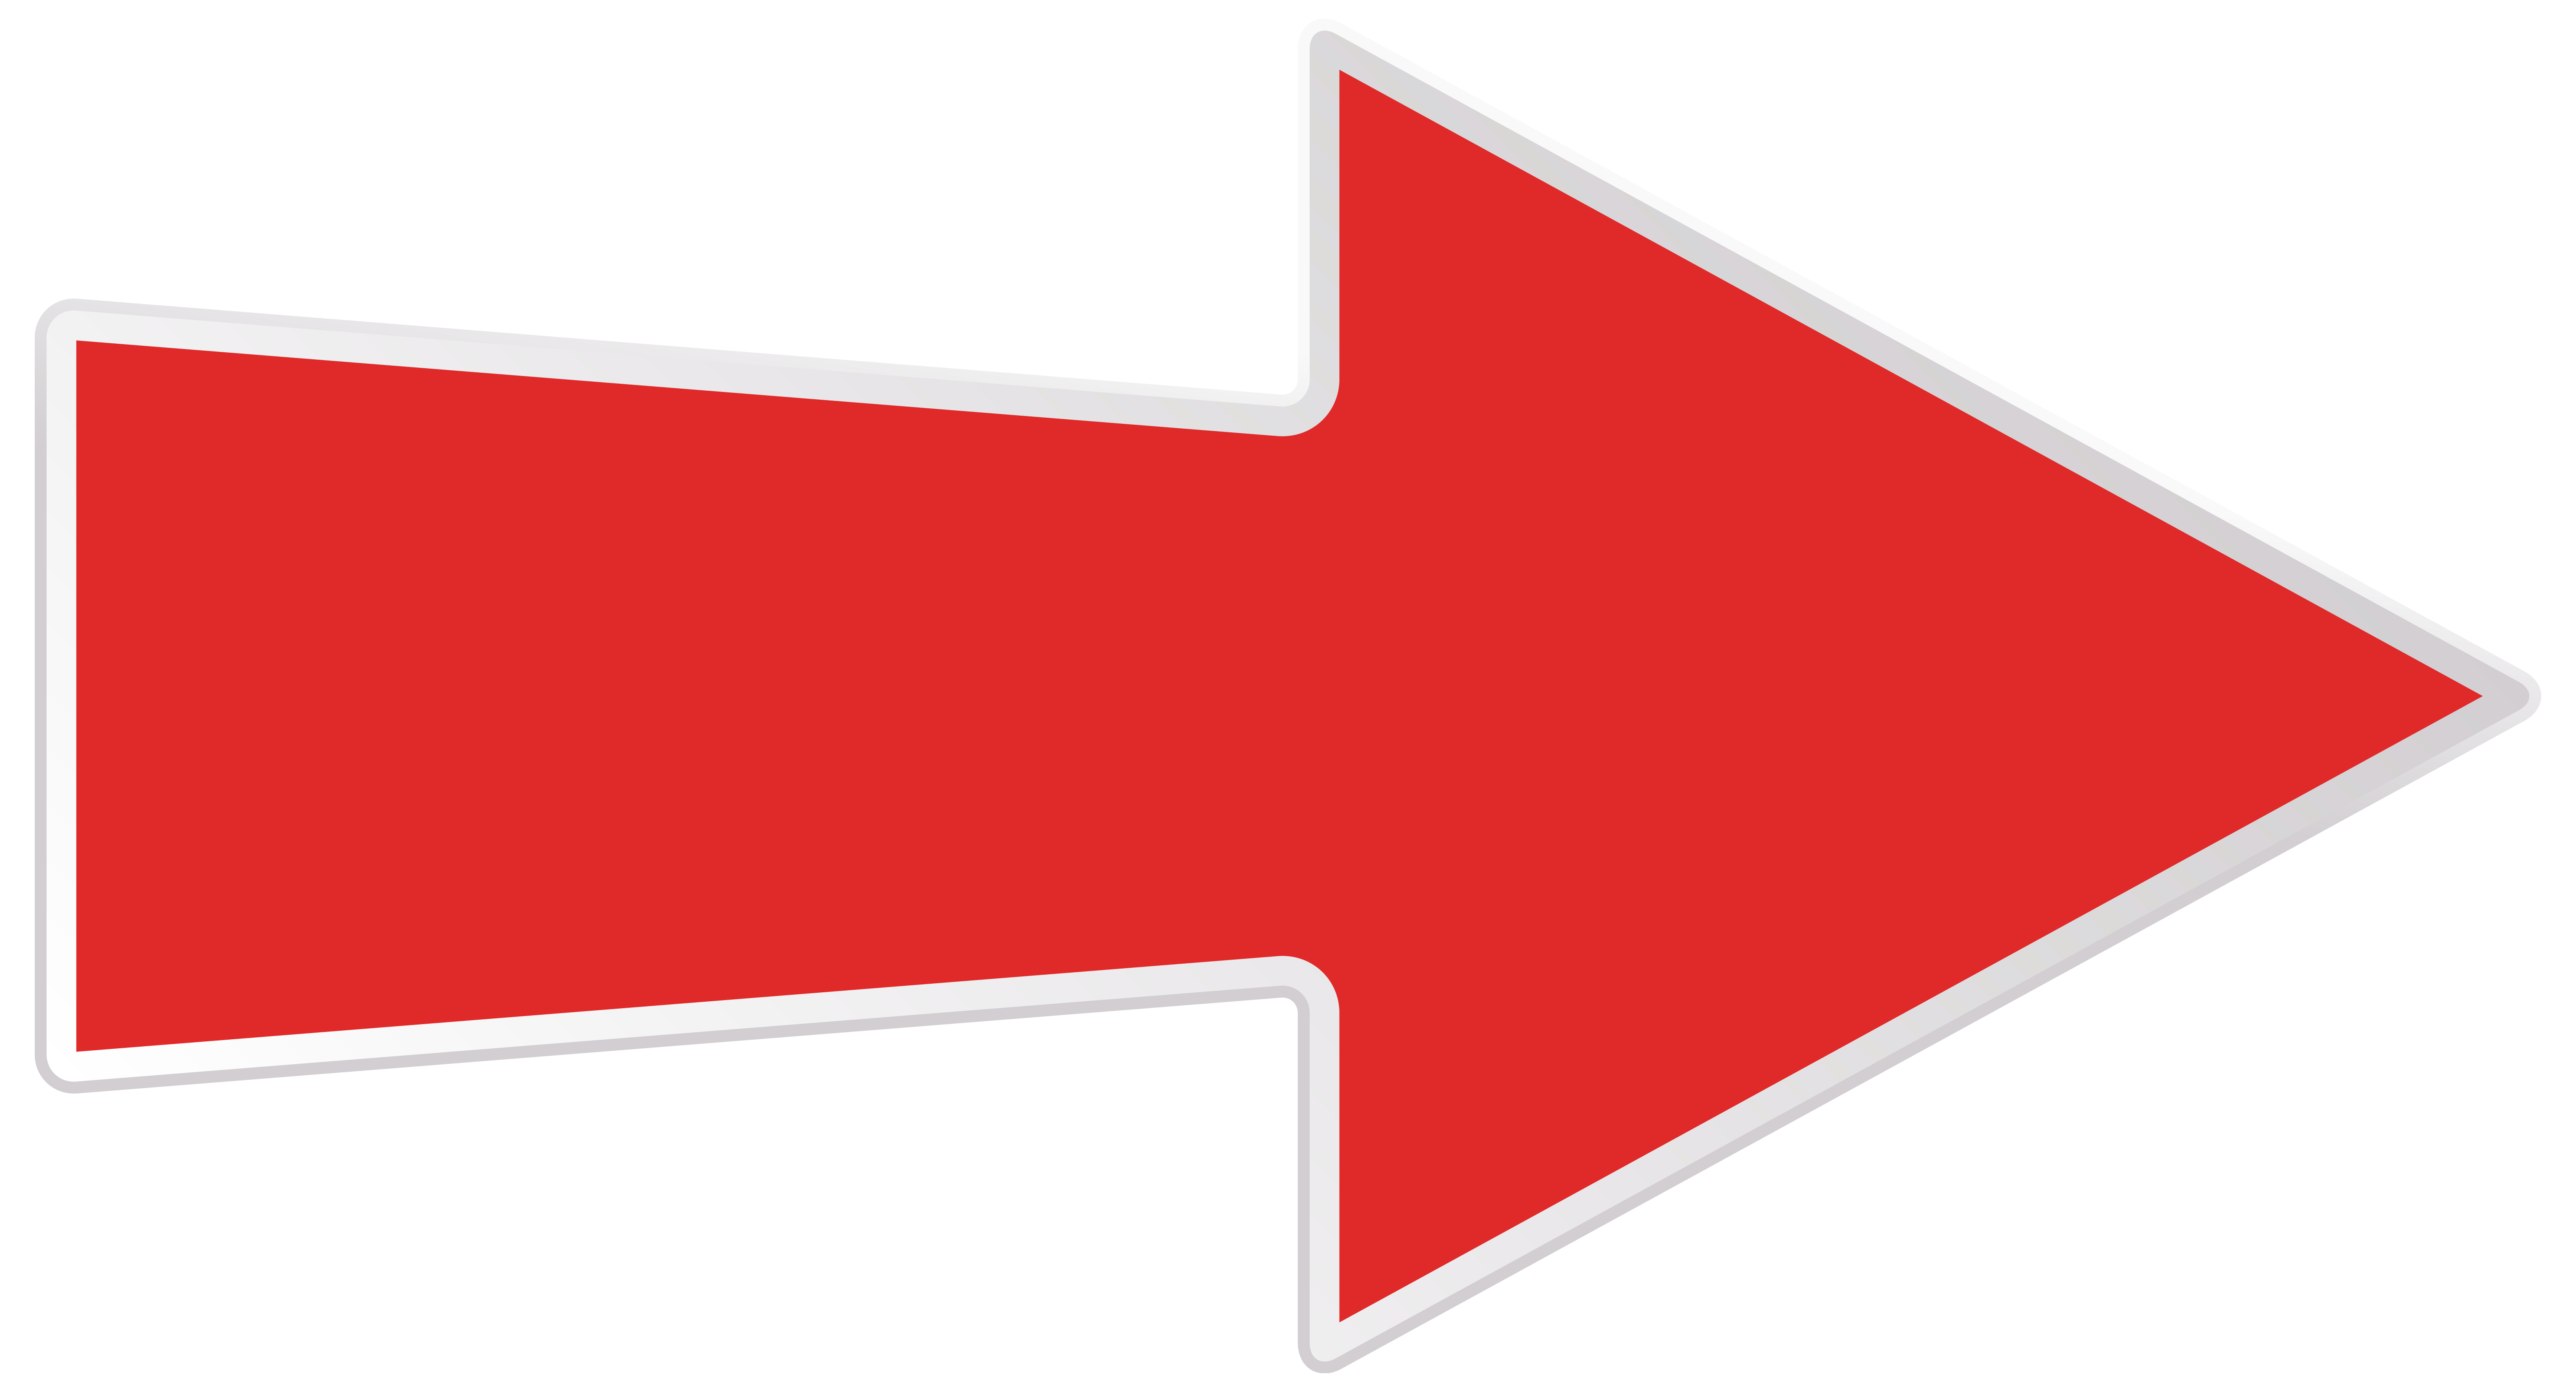 Block arrow clipart banner stock Red Right Arrow Transparent PNG Clip Art Image   Cosas que me ... banner stock